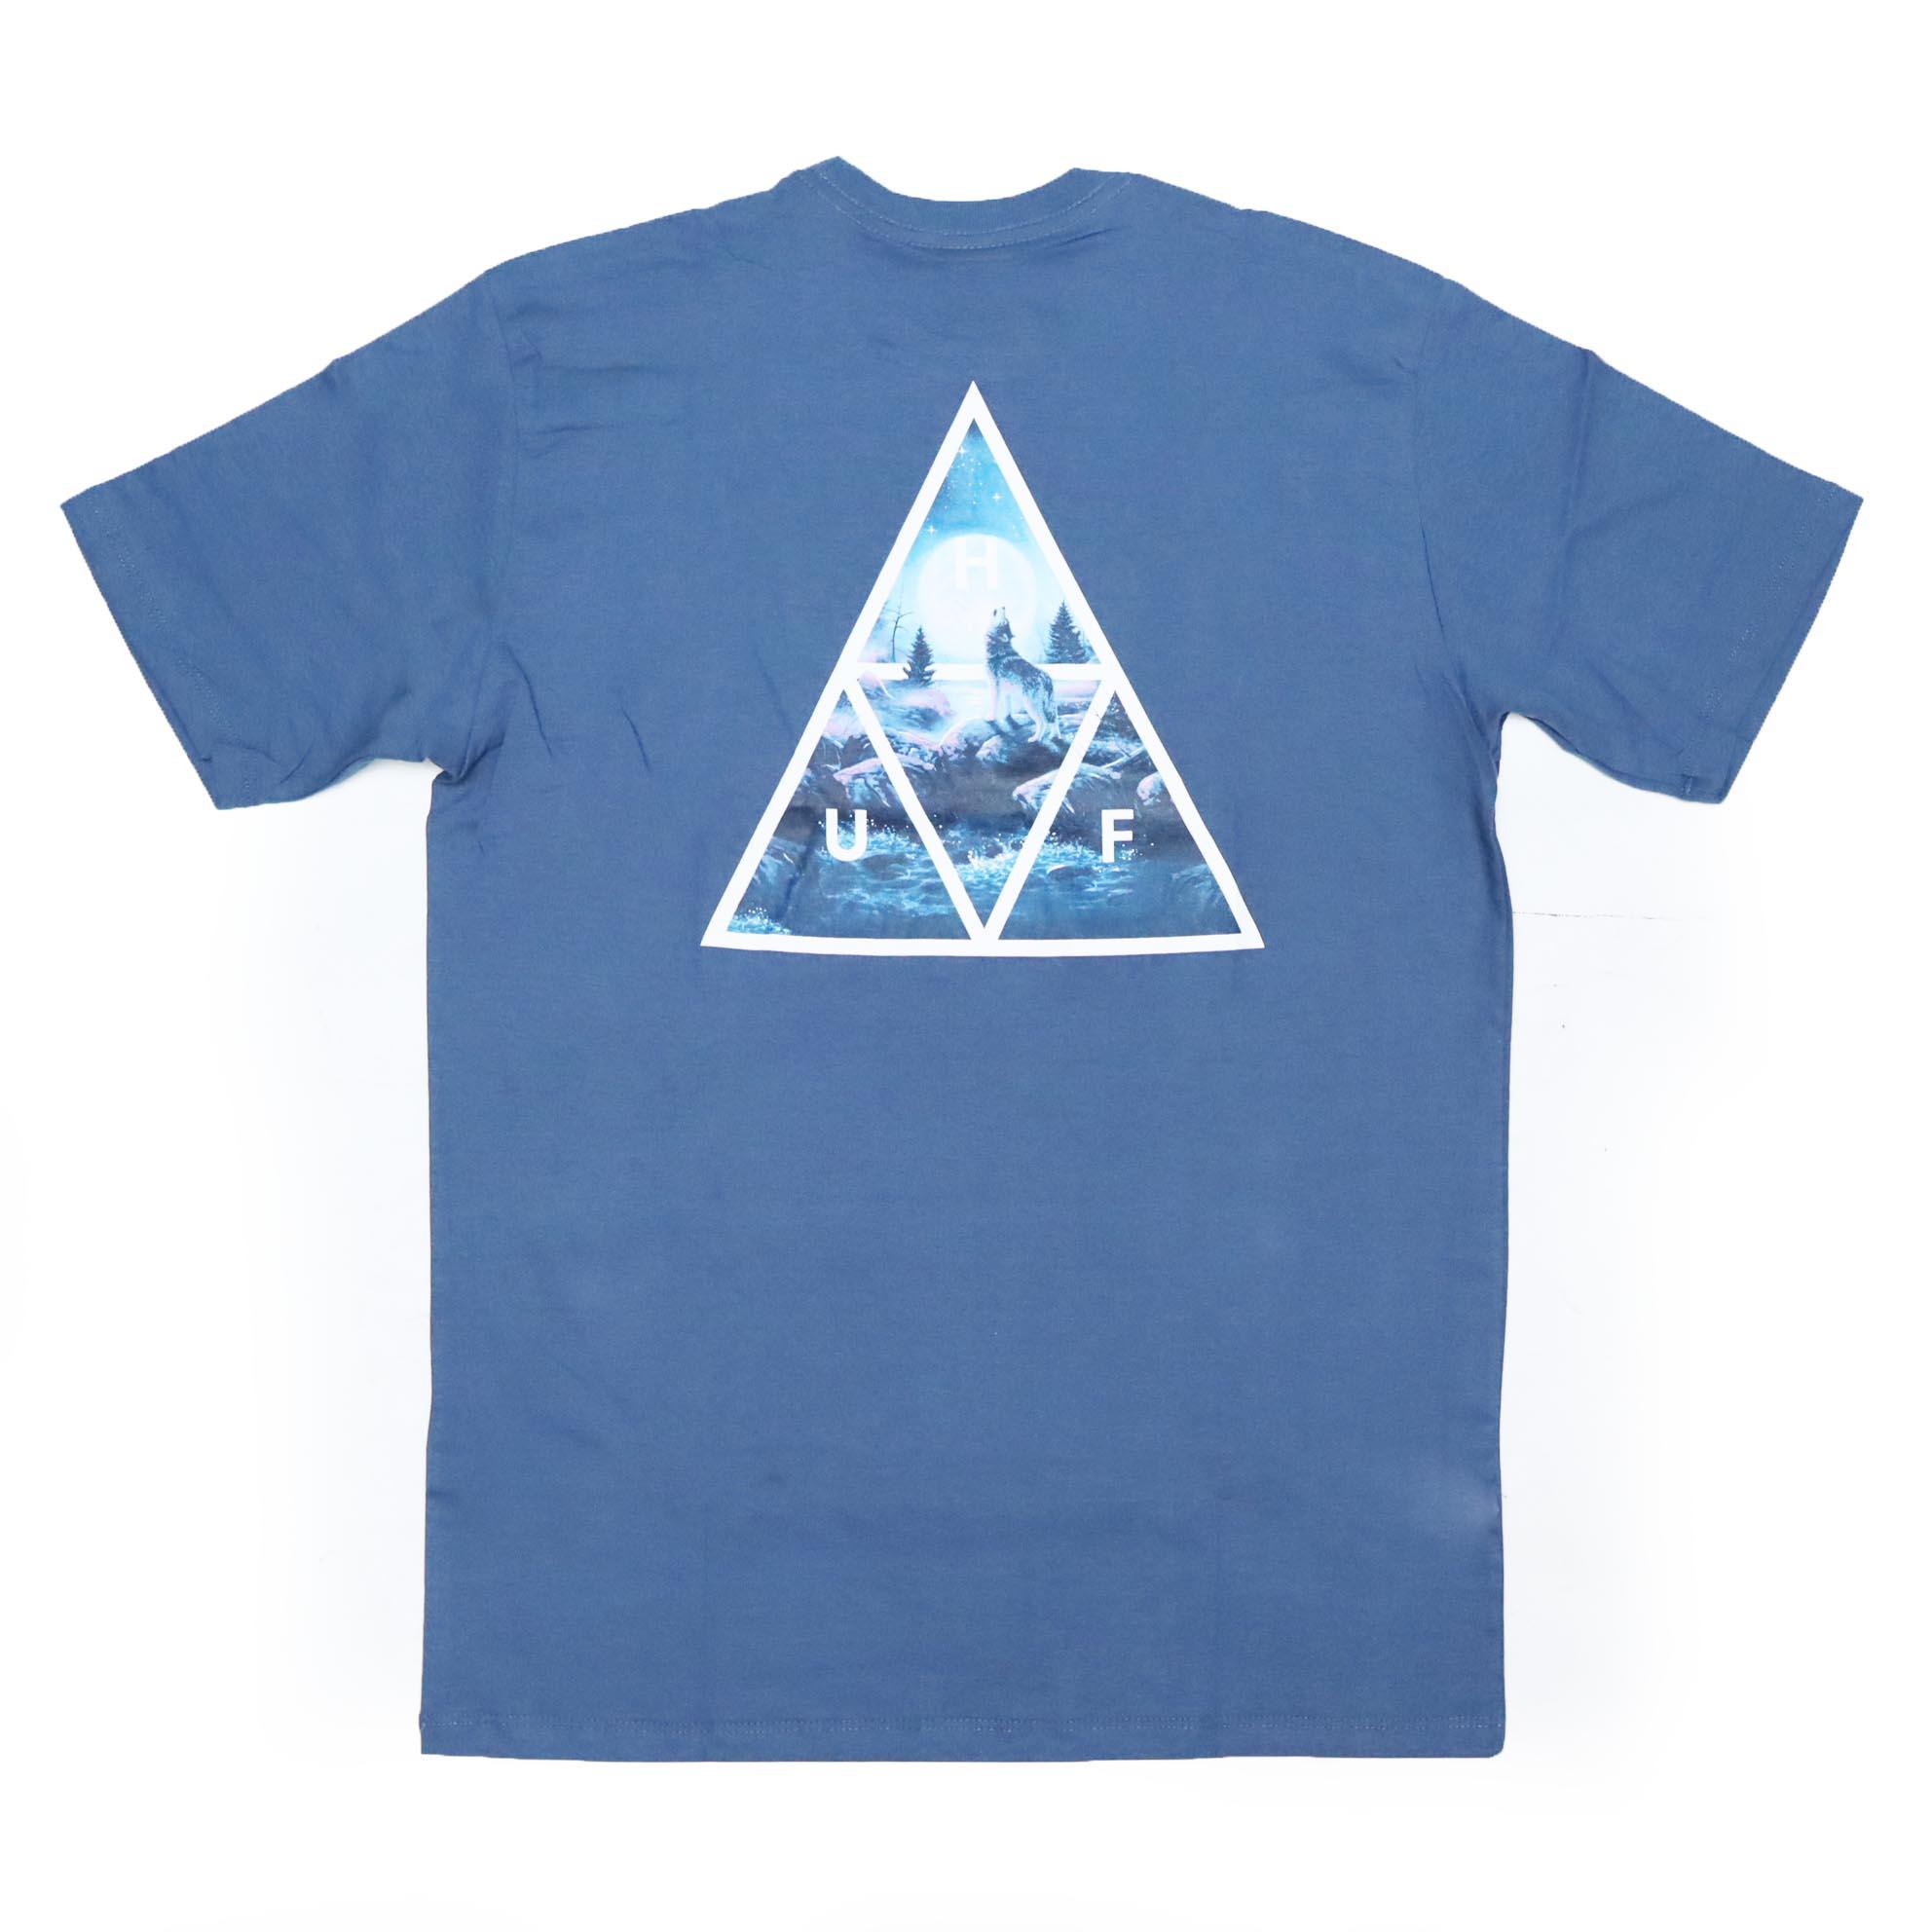 Camiseta HUF Lupus Noctem - Azul Marinho